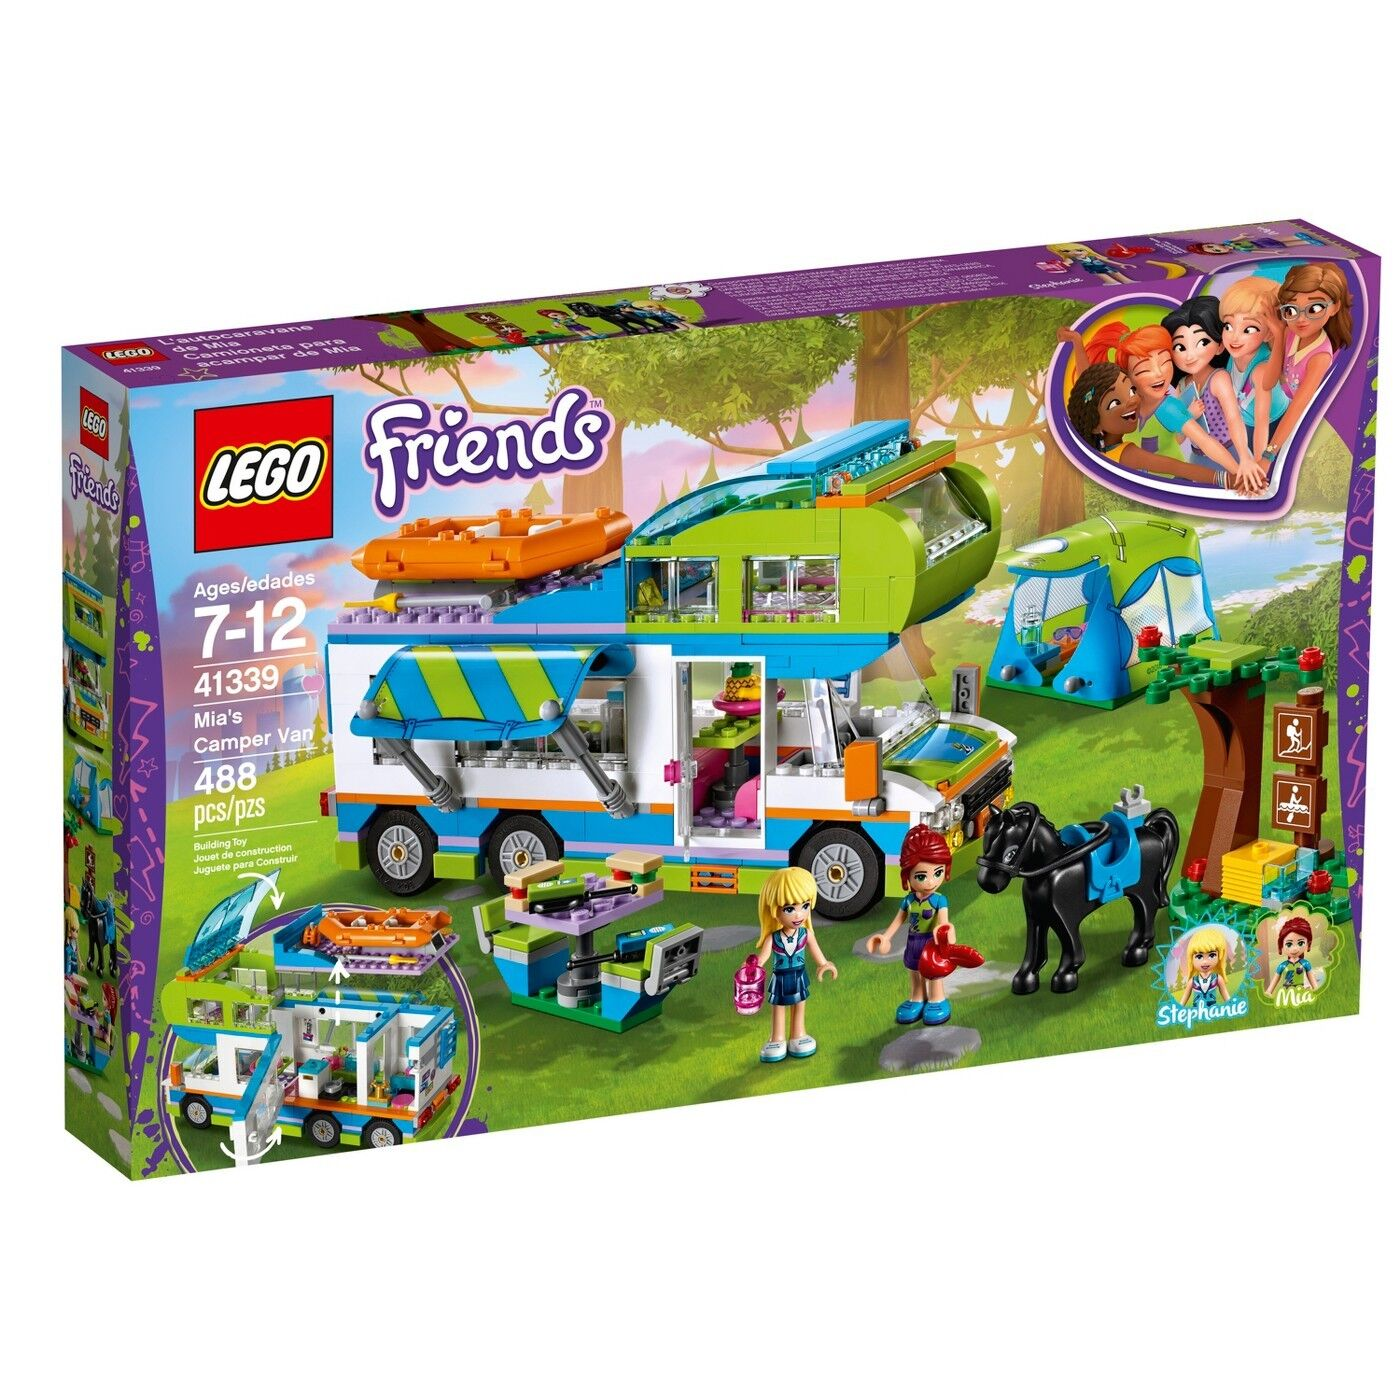 LEGO FRIENDS / MIA'S CAMPER VAN RAFT HORSE STEPHANIE 488 PIECES / 41339 SEALED